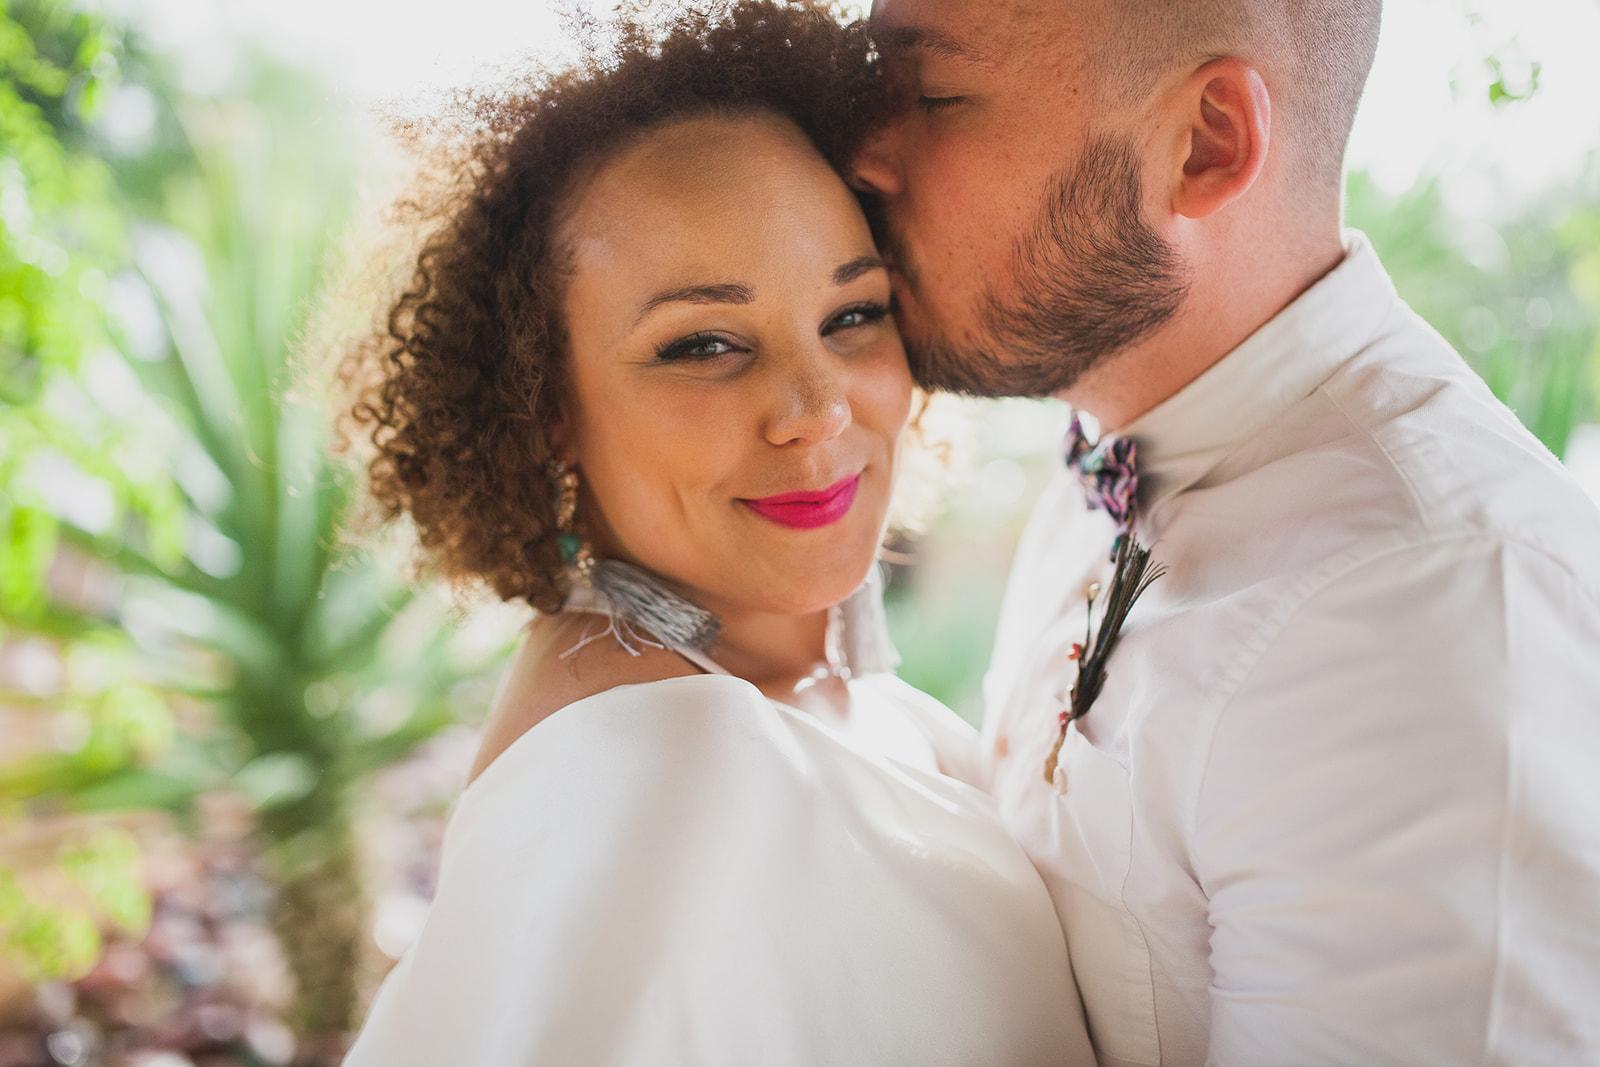 a groom kisses a bride, close shot. fawakay villas marrakech wedding morrocco wedding photography. stop motion wedding films uk